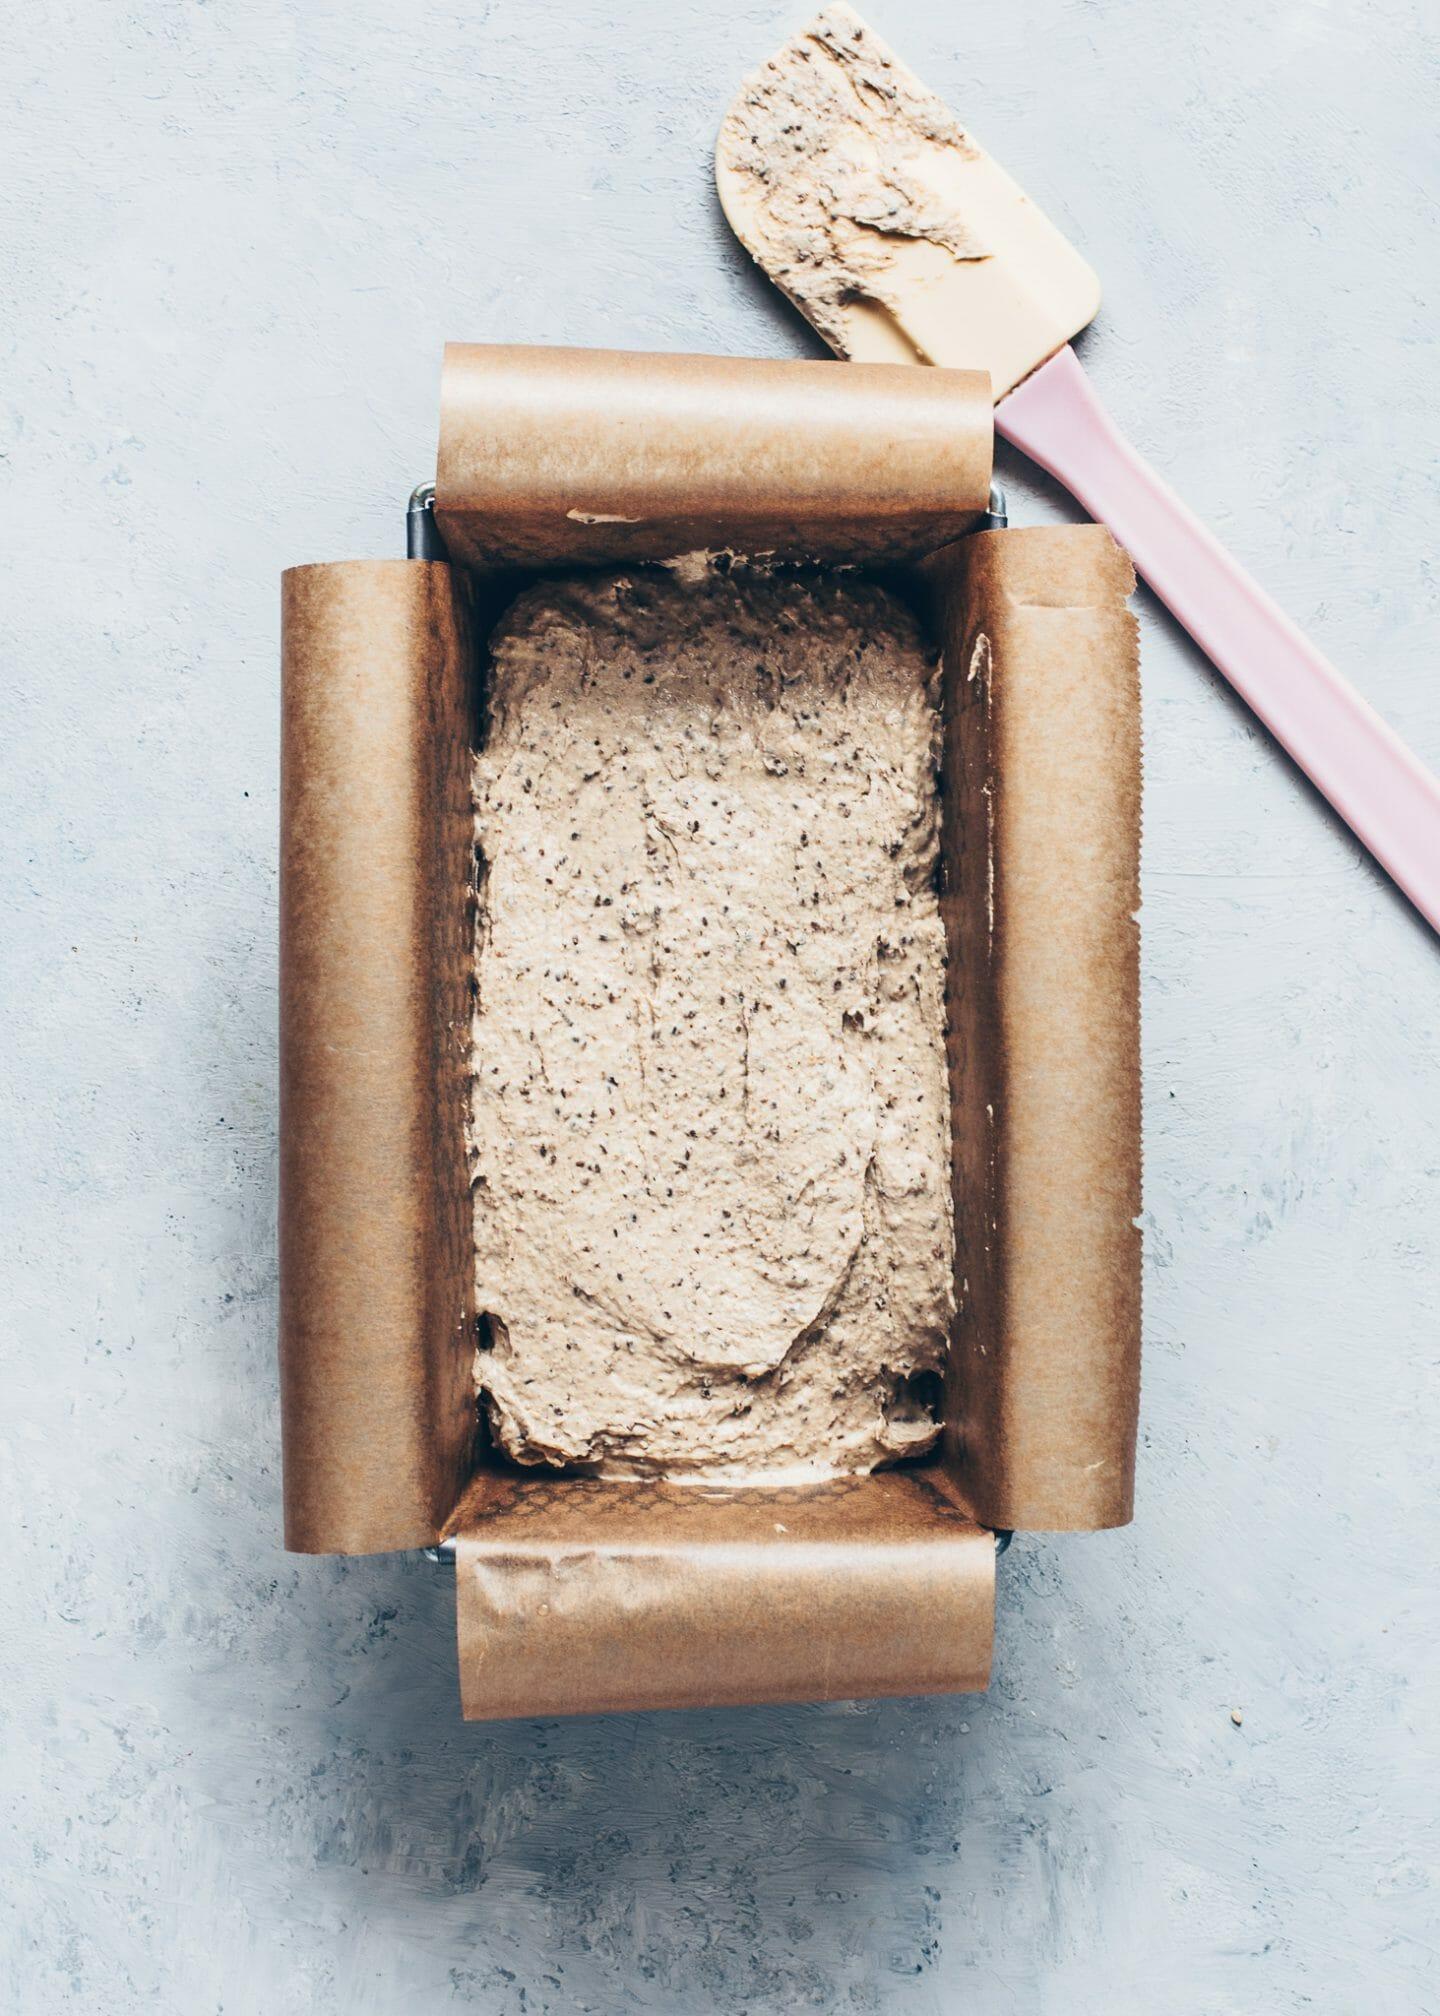 How to make buckwheat chia bread (paleo, vegan, egg-less, healthy, dairy-free)